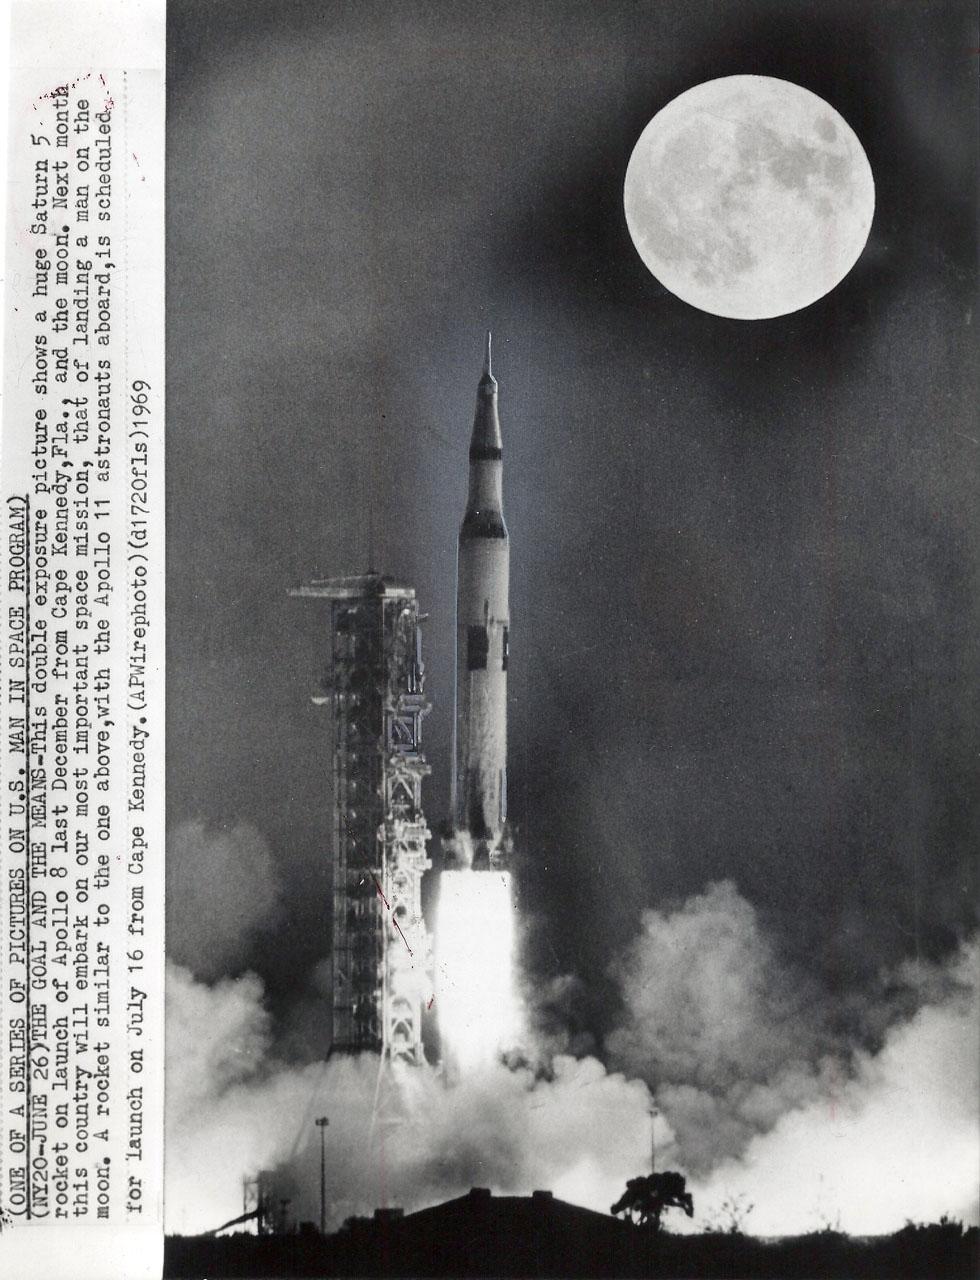 Signed Covers: USA 1968 Apollo 8